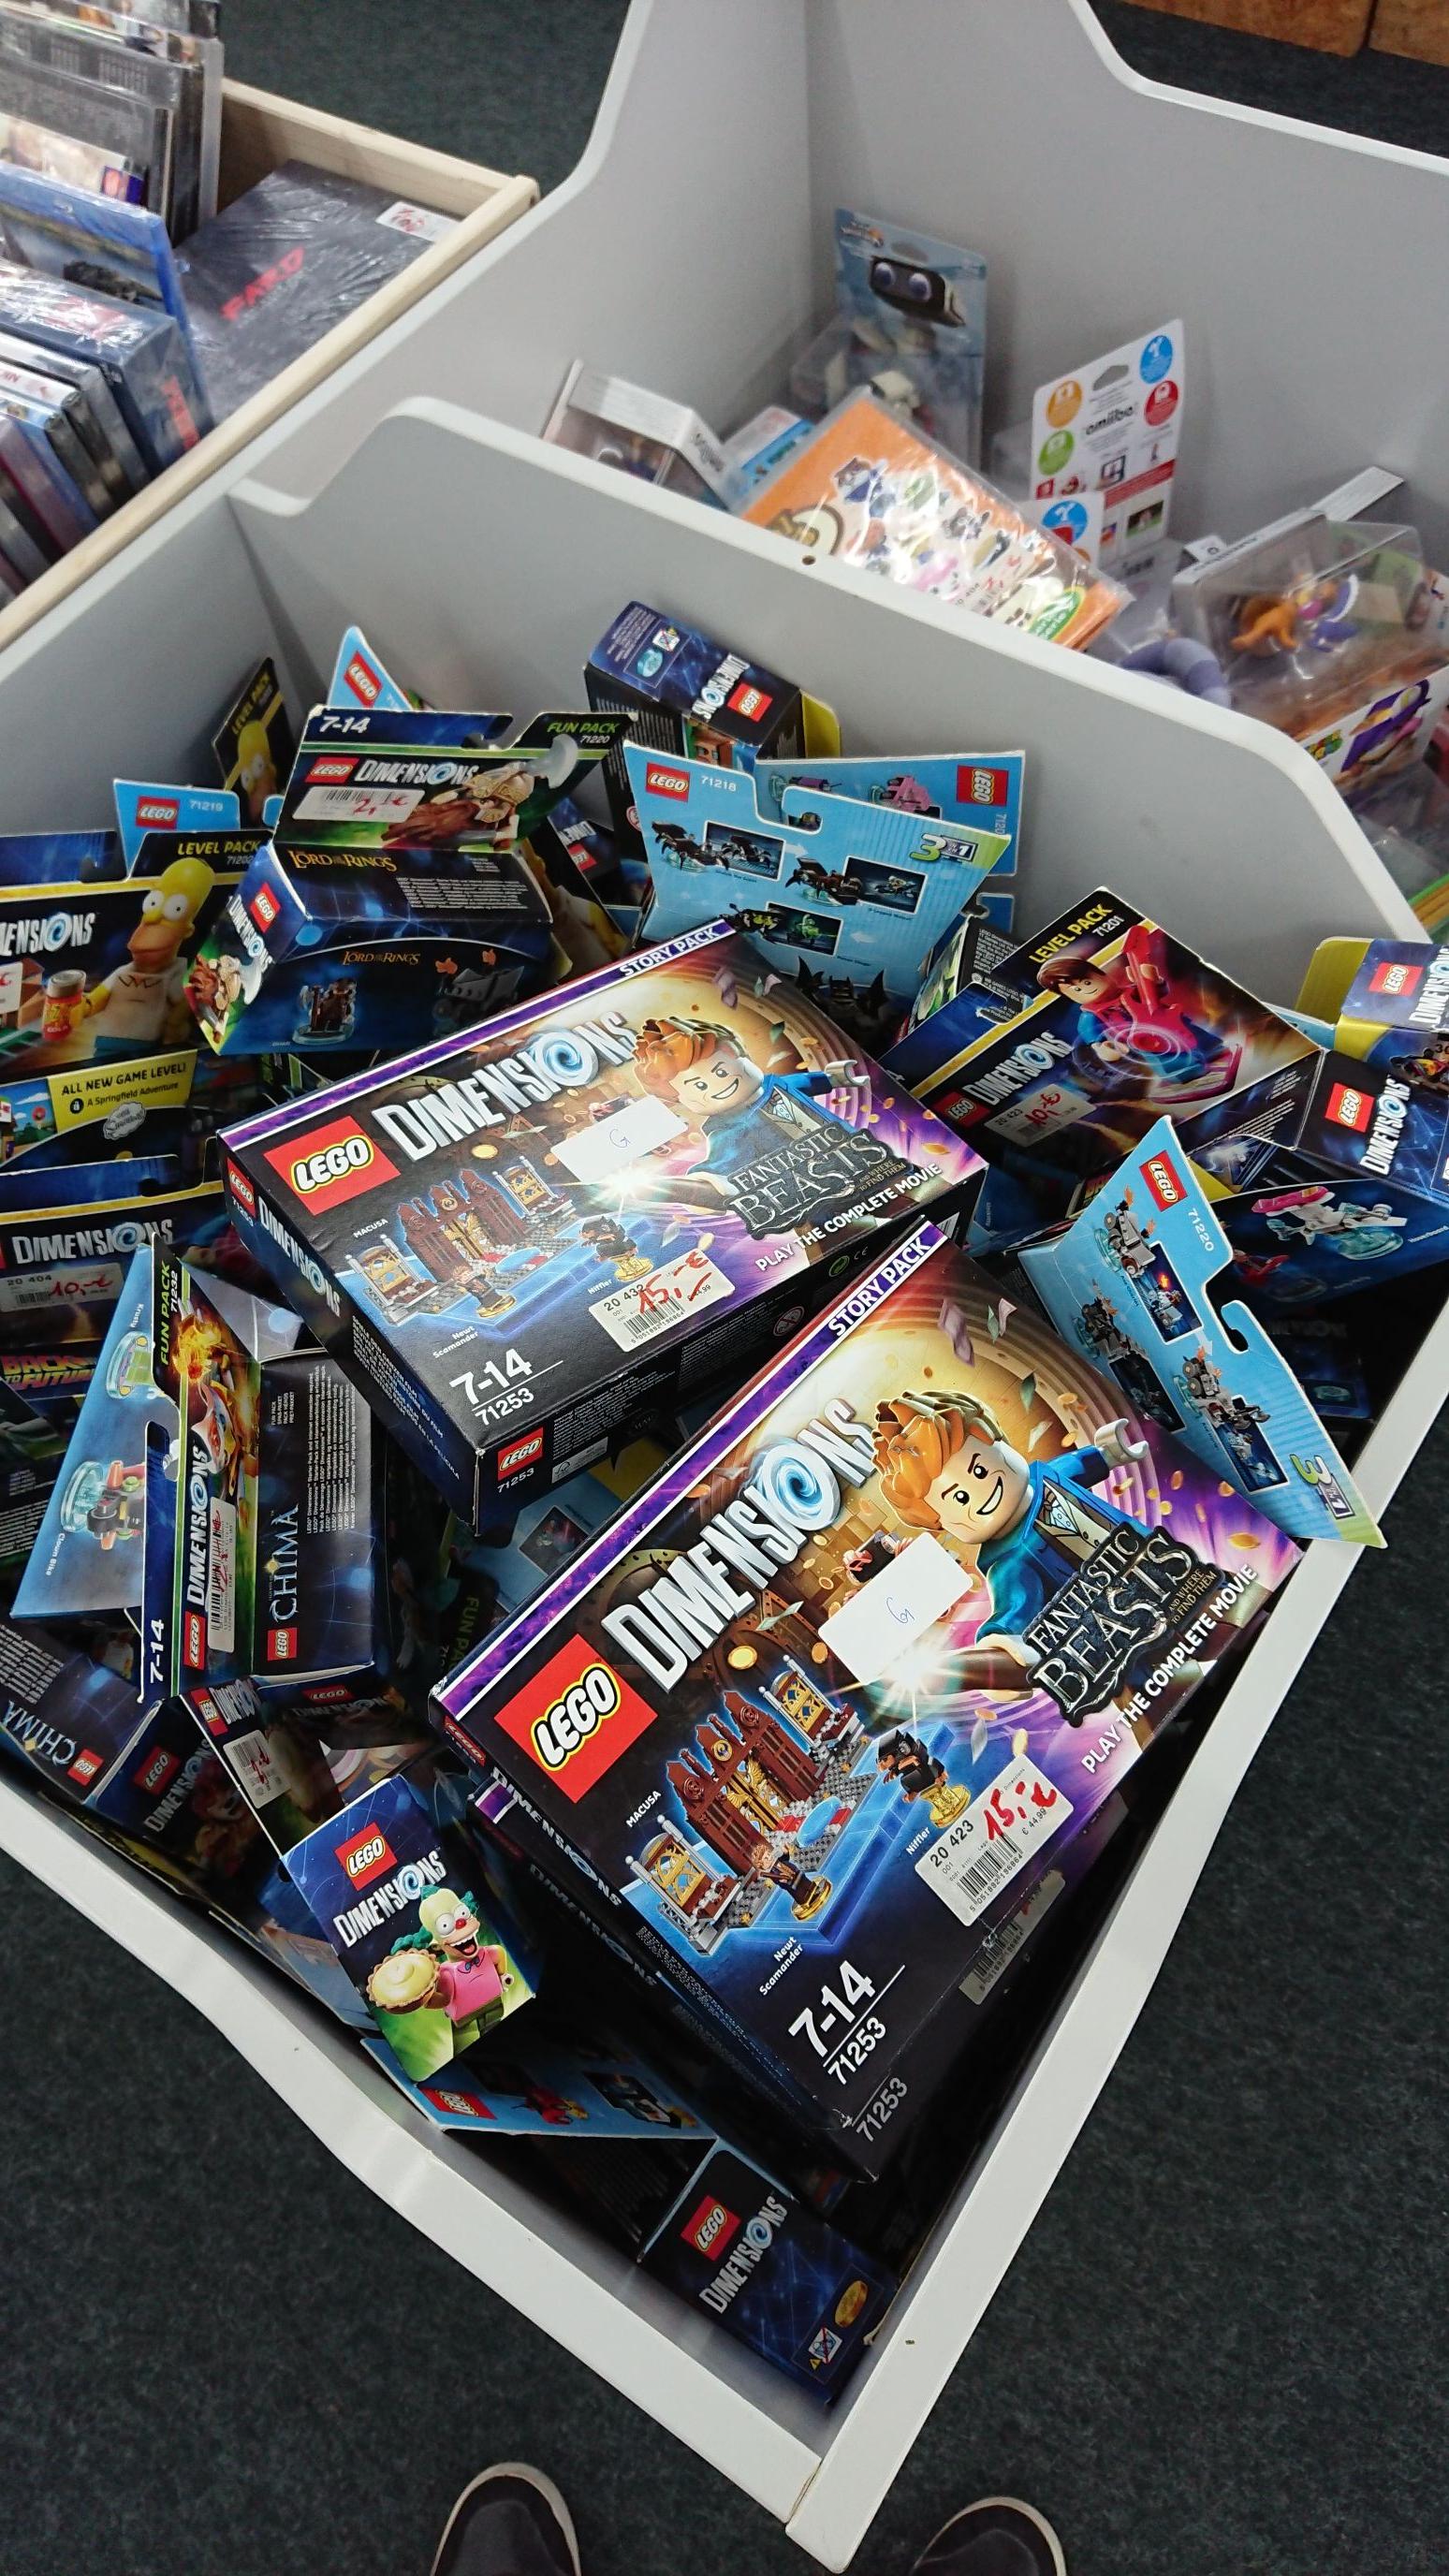 (Lokal) Medimax Grevenbroich Lego Dimensions, Amiibo etc.